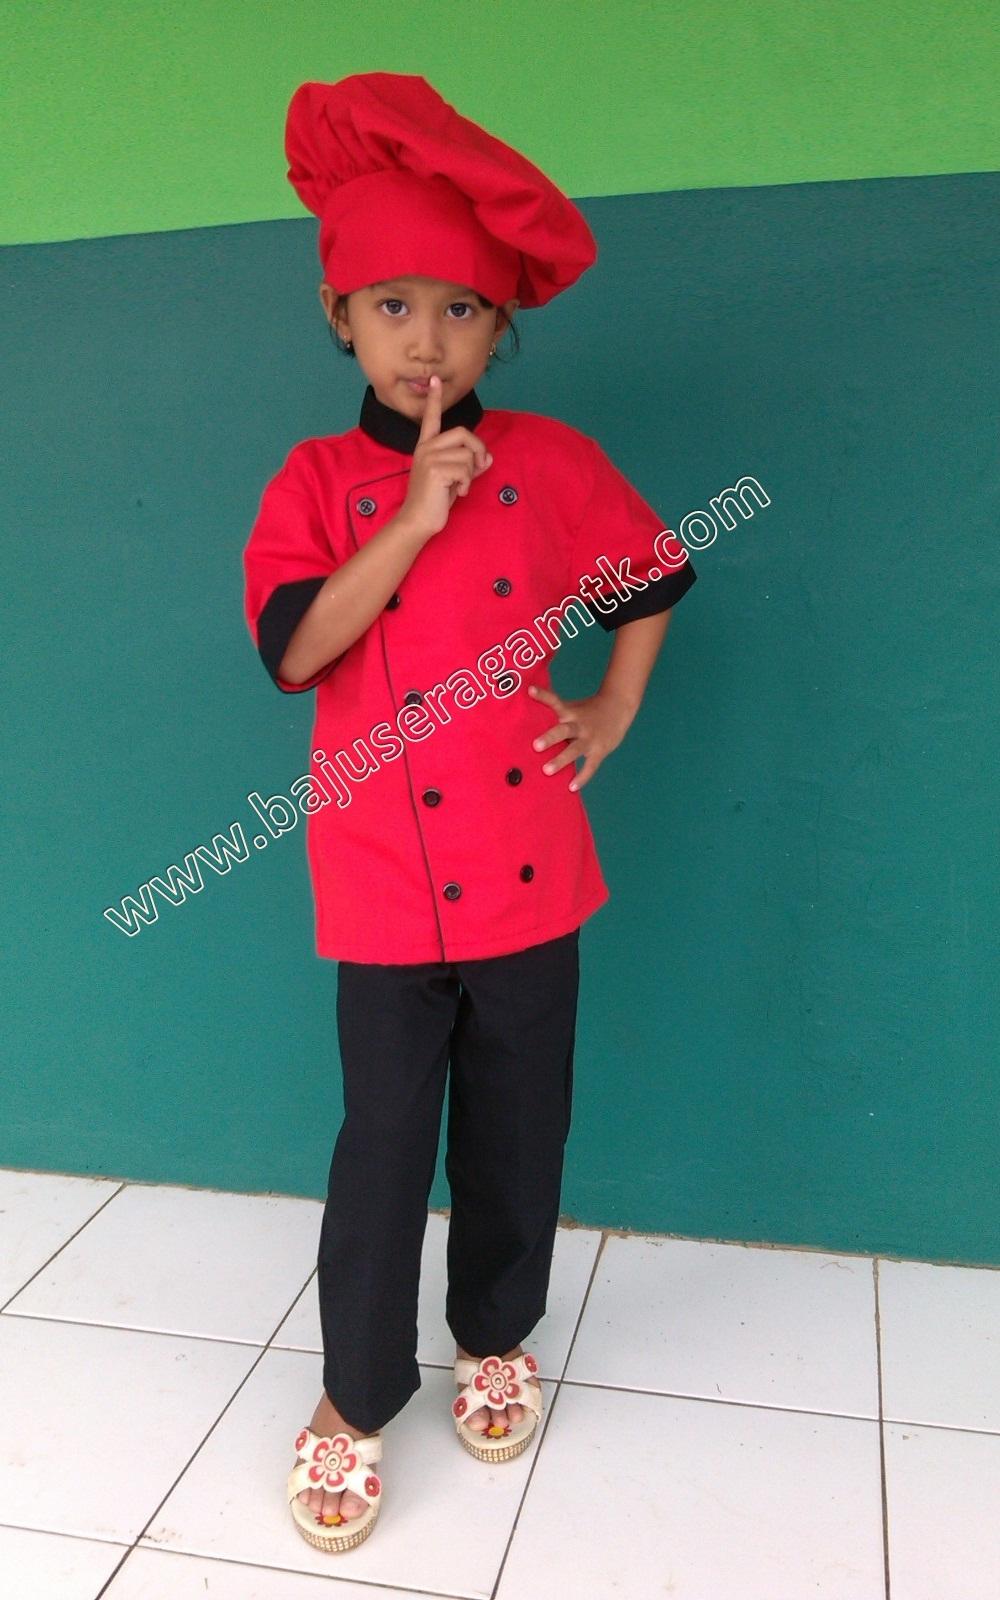 baju profesi anak  baju chef anak baju koki anak